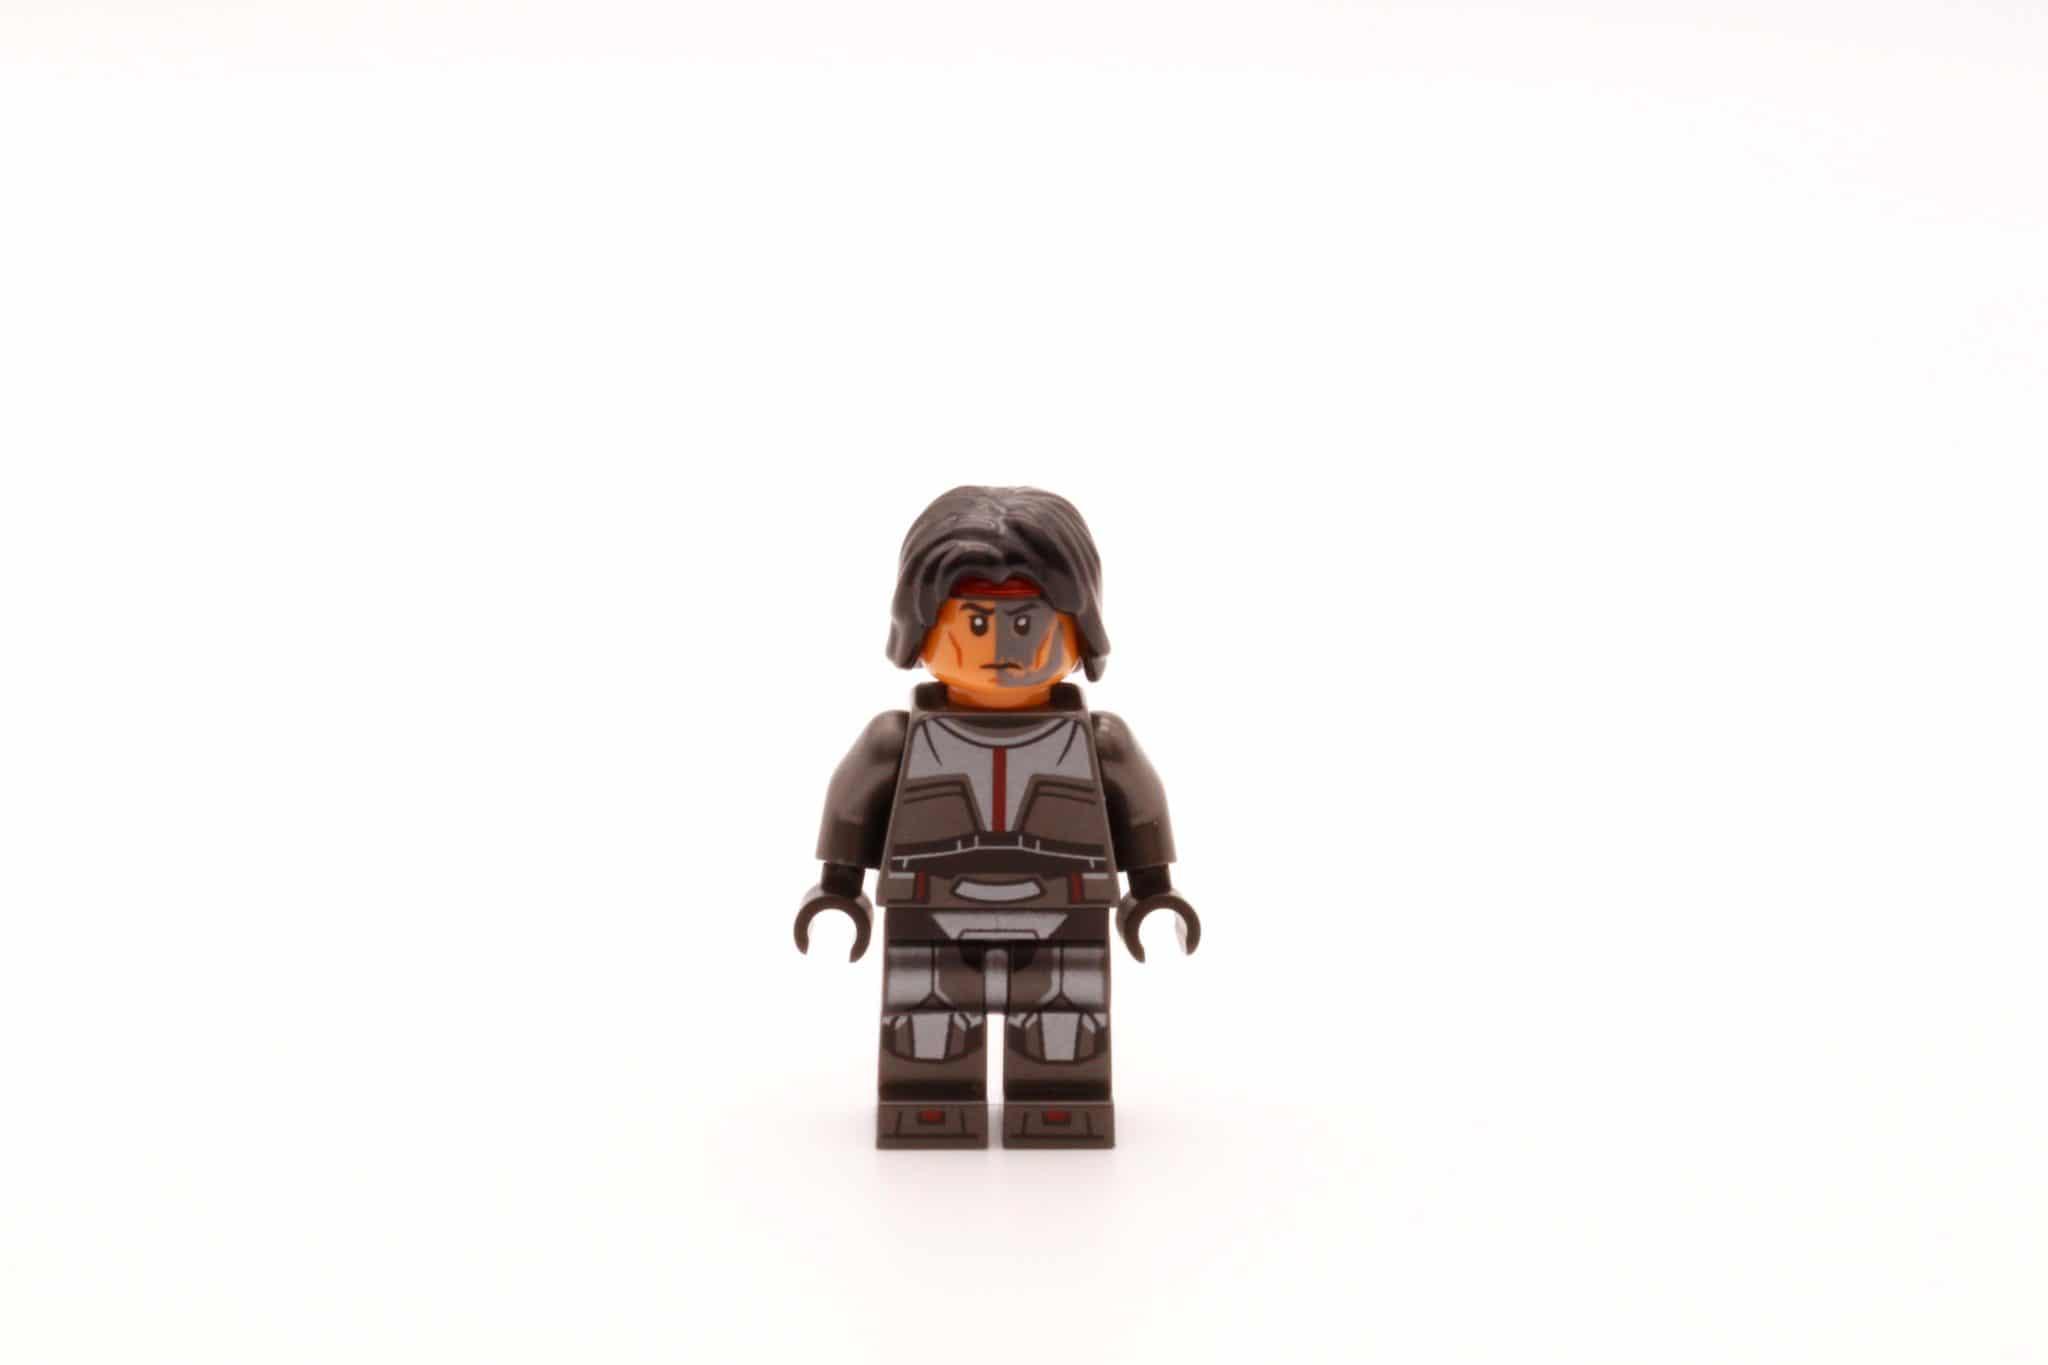 LEGO Star Wars 75314 The Bad Batch Attack Shuttle Hunter Haare